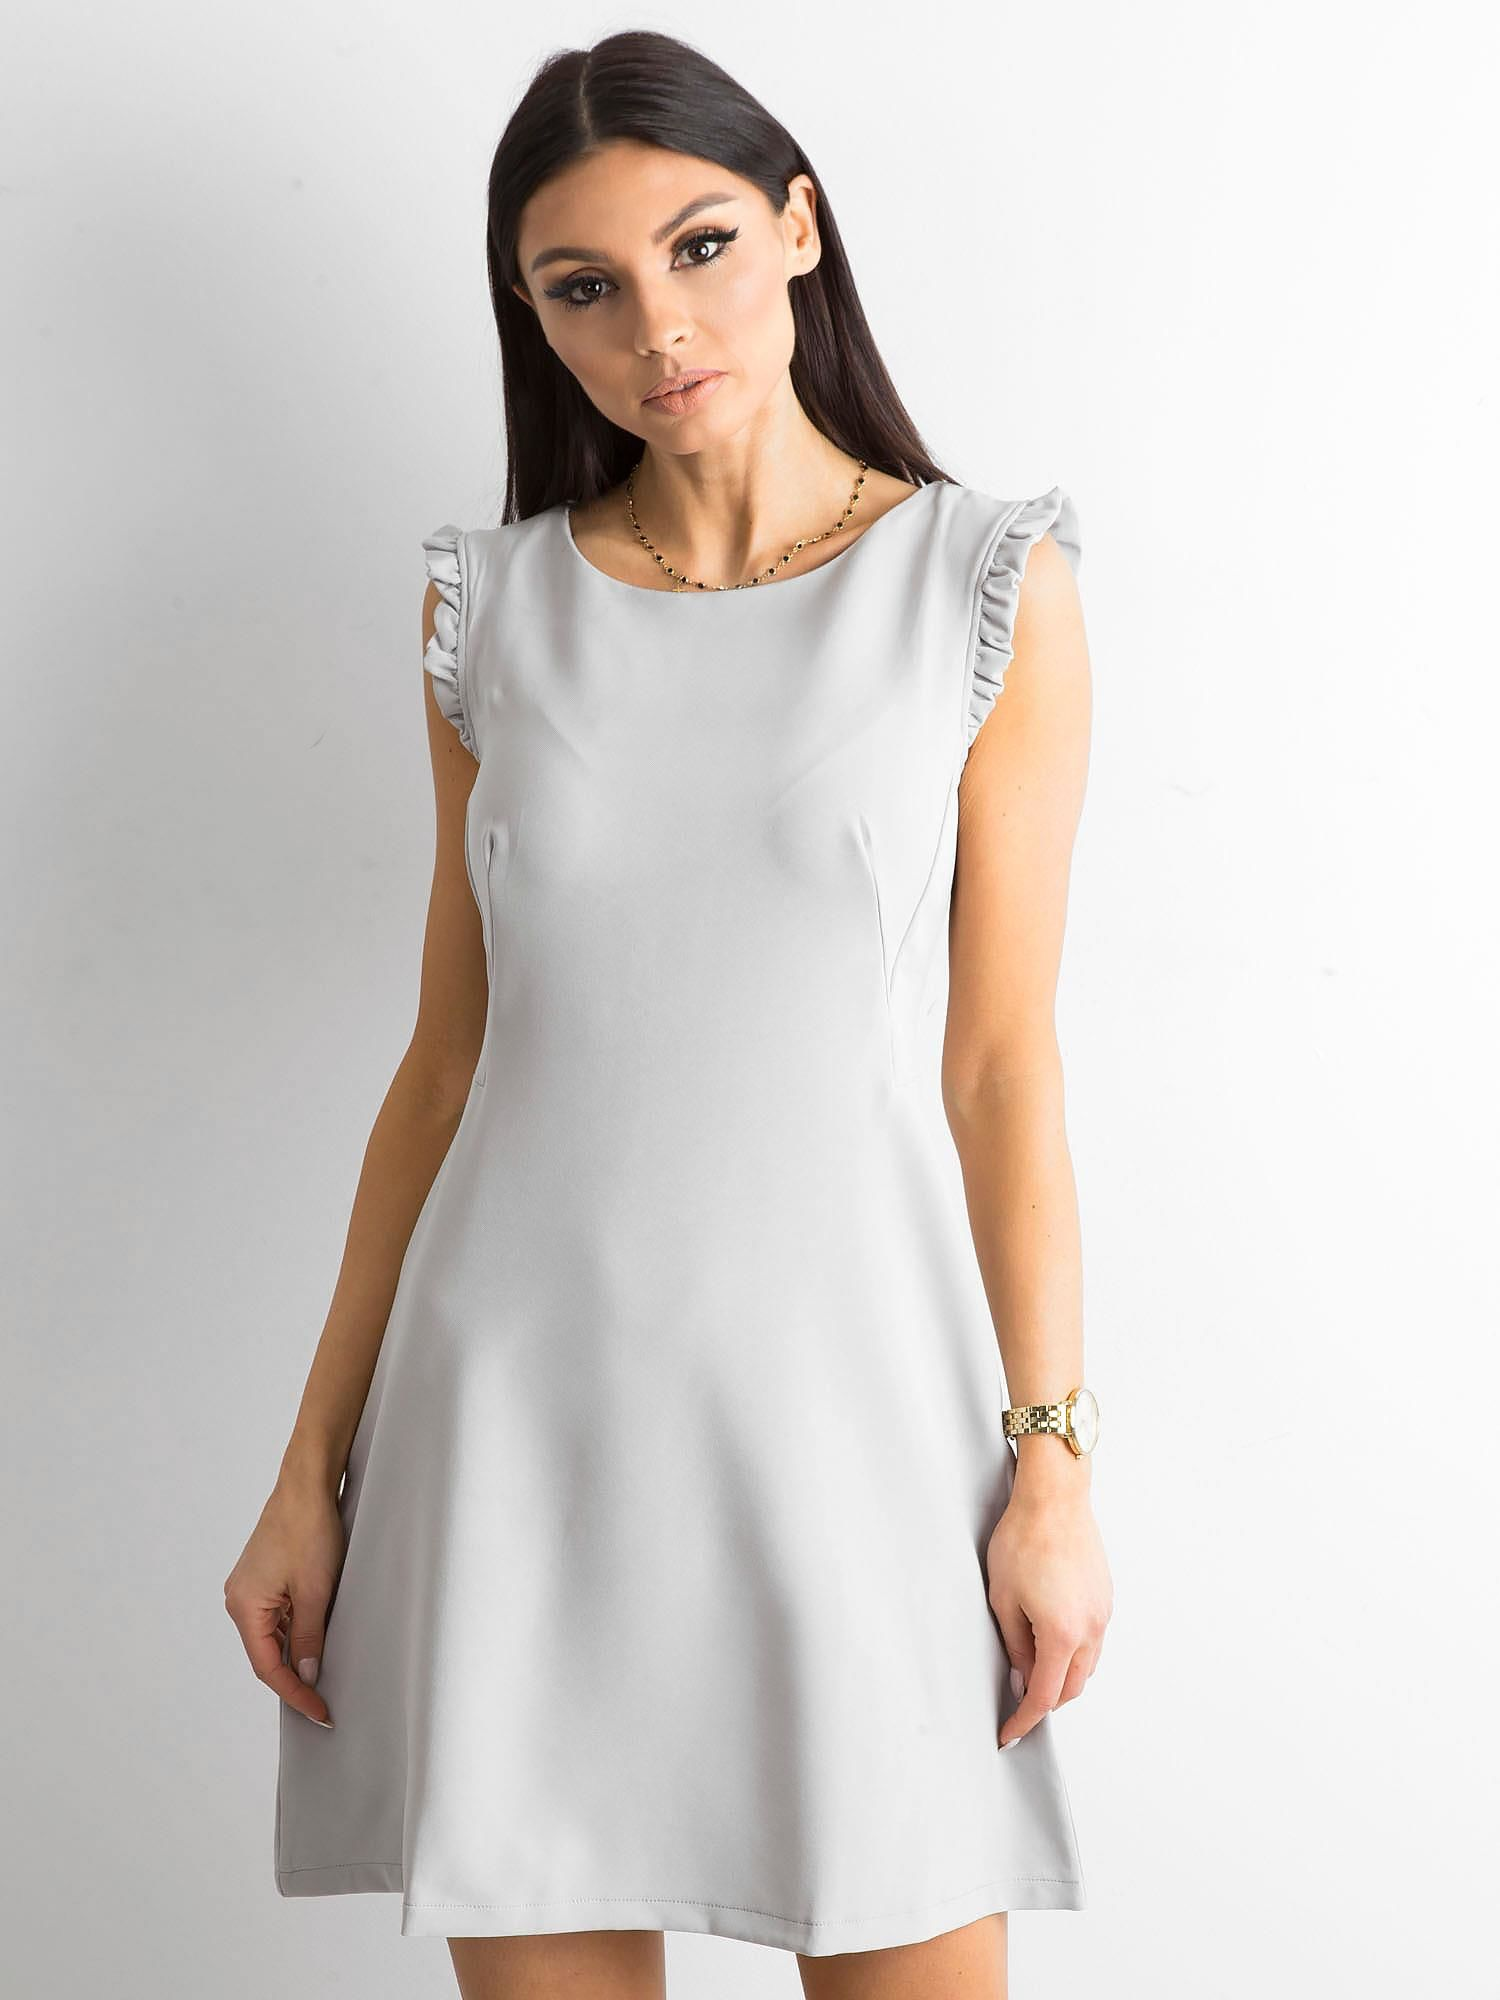 15258ae1e2 Elegancka sukienka szara - Sukienka koktajlowa - sklep eButik.pl